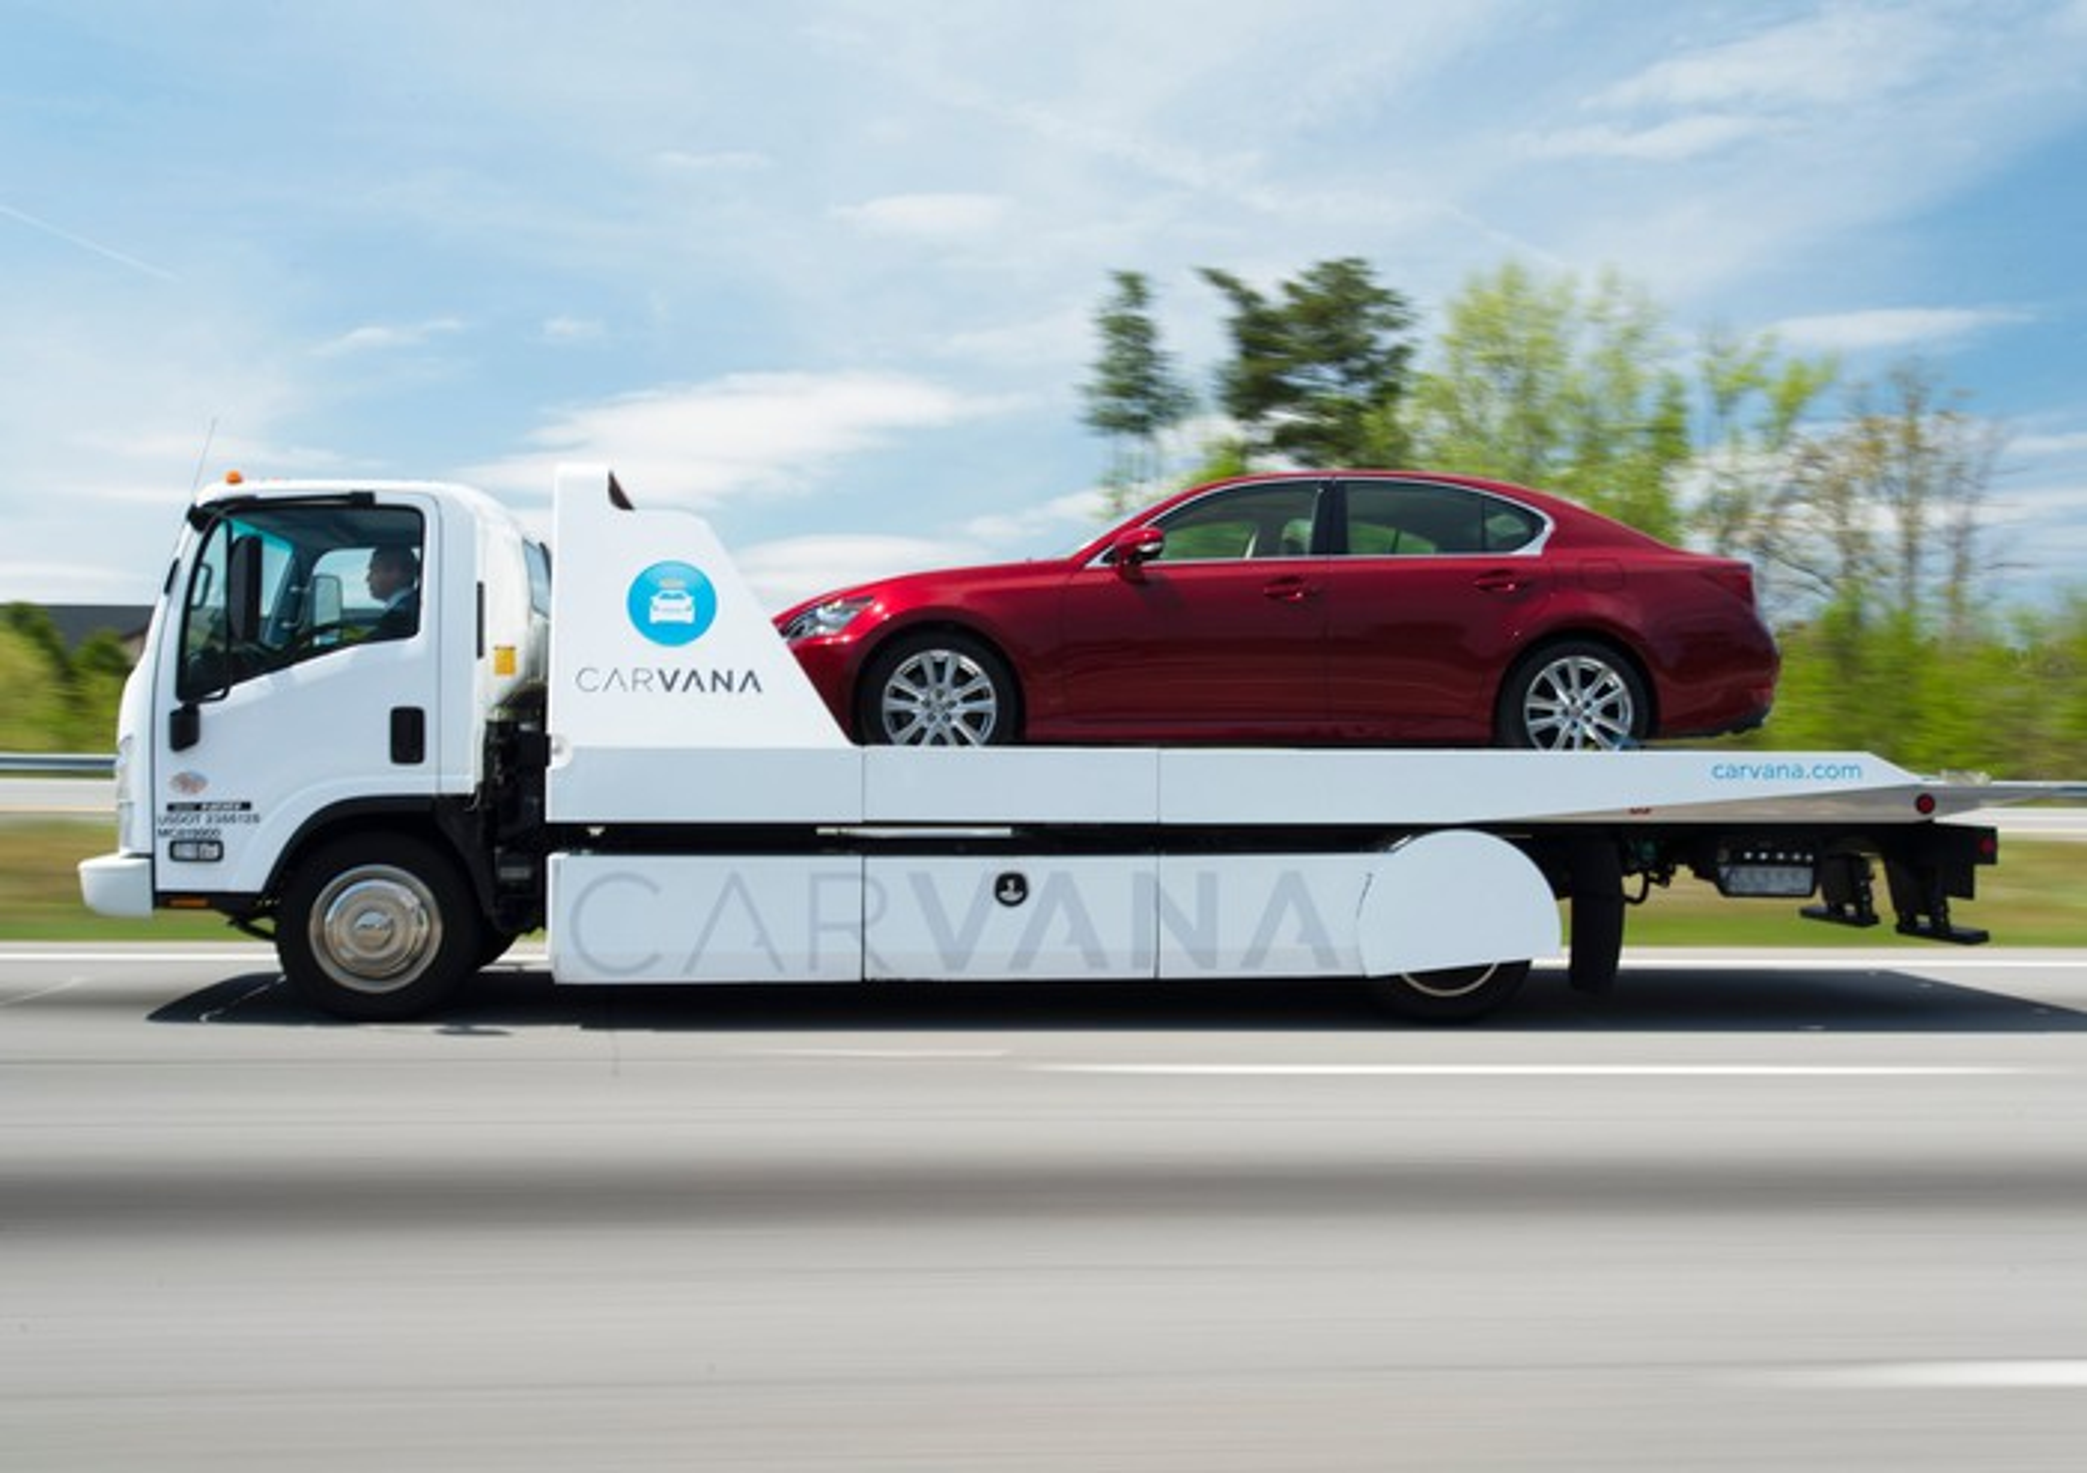 Car on the back of a Carvana trailer.